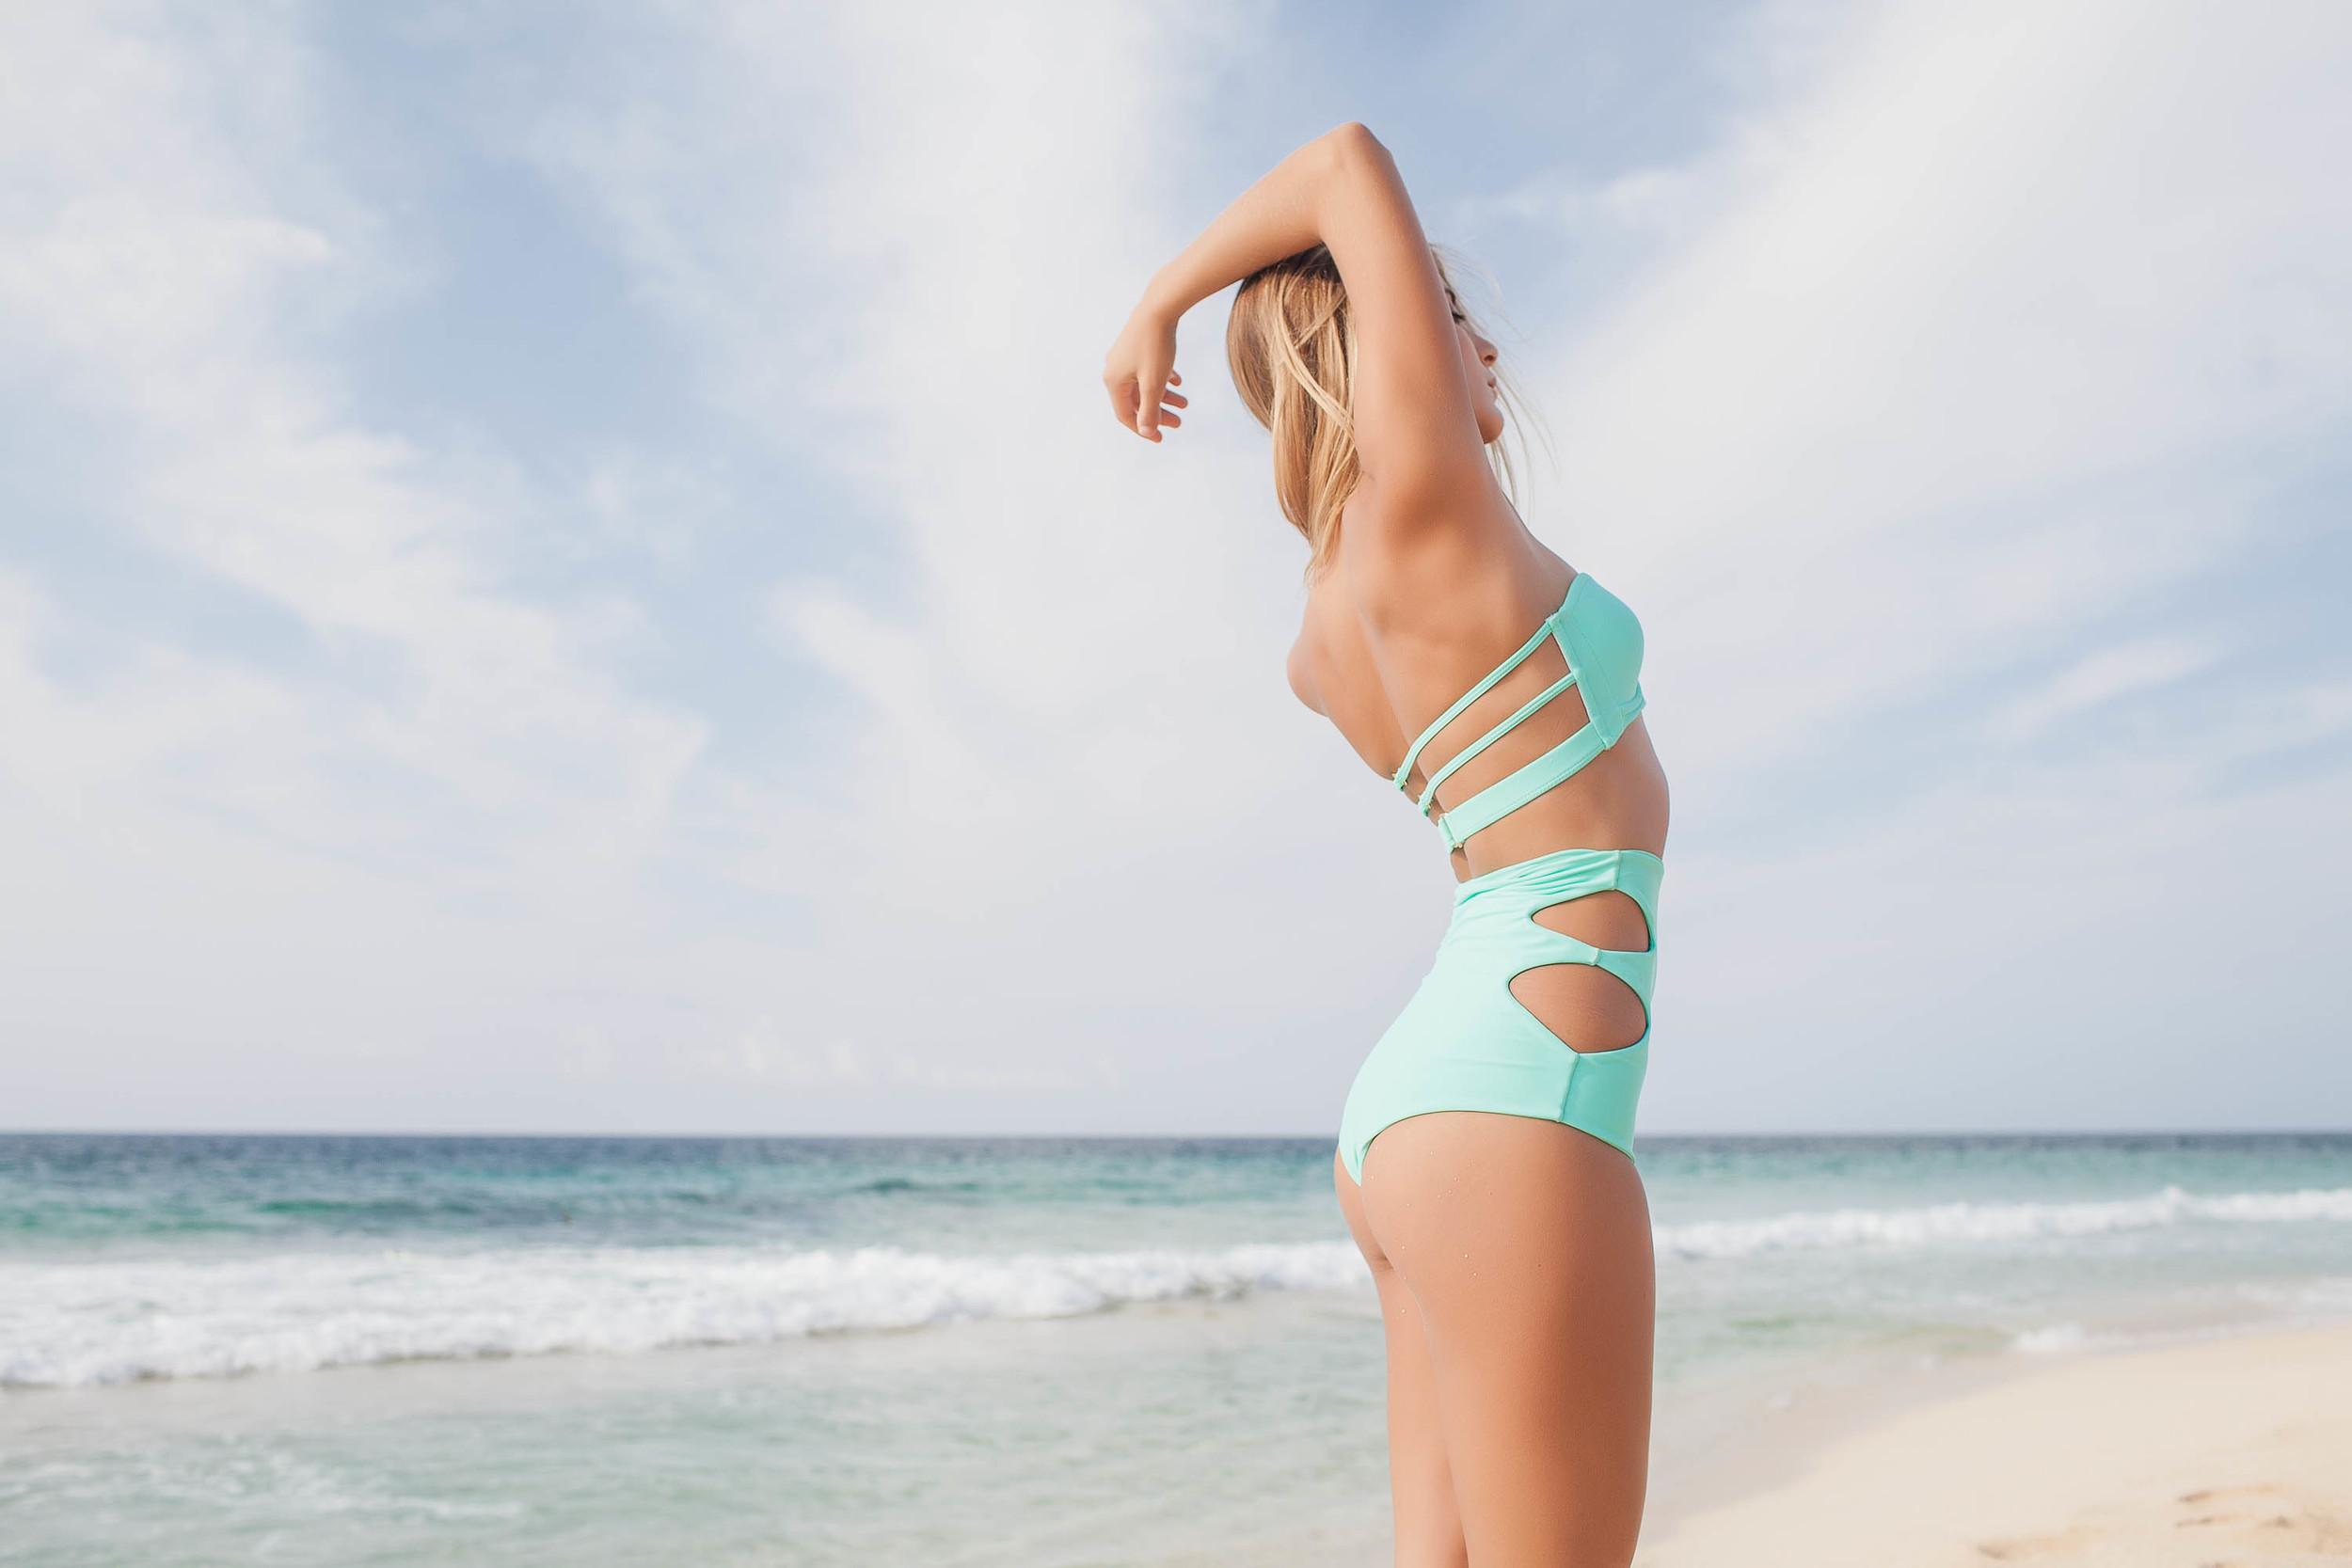 bryce-johnson-issademar-glee-actor-model-bikini-hawaii-11.jpg